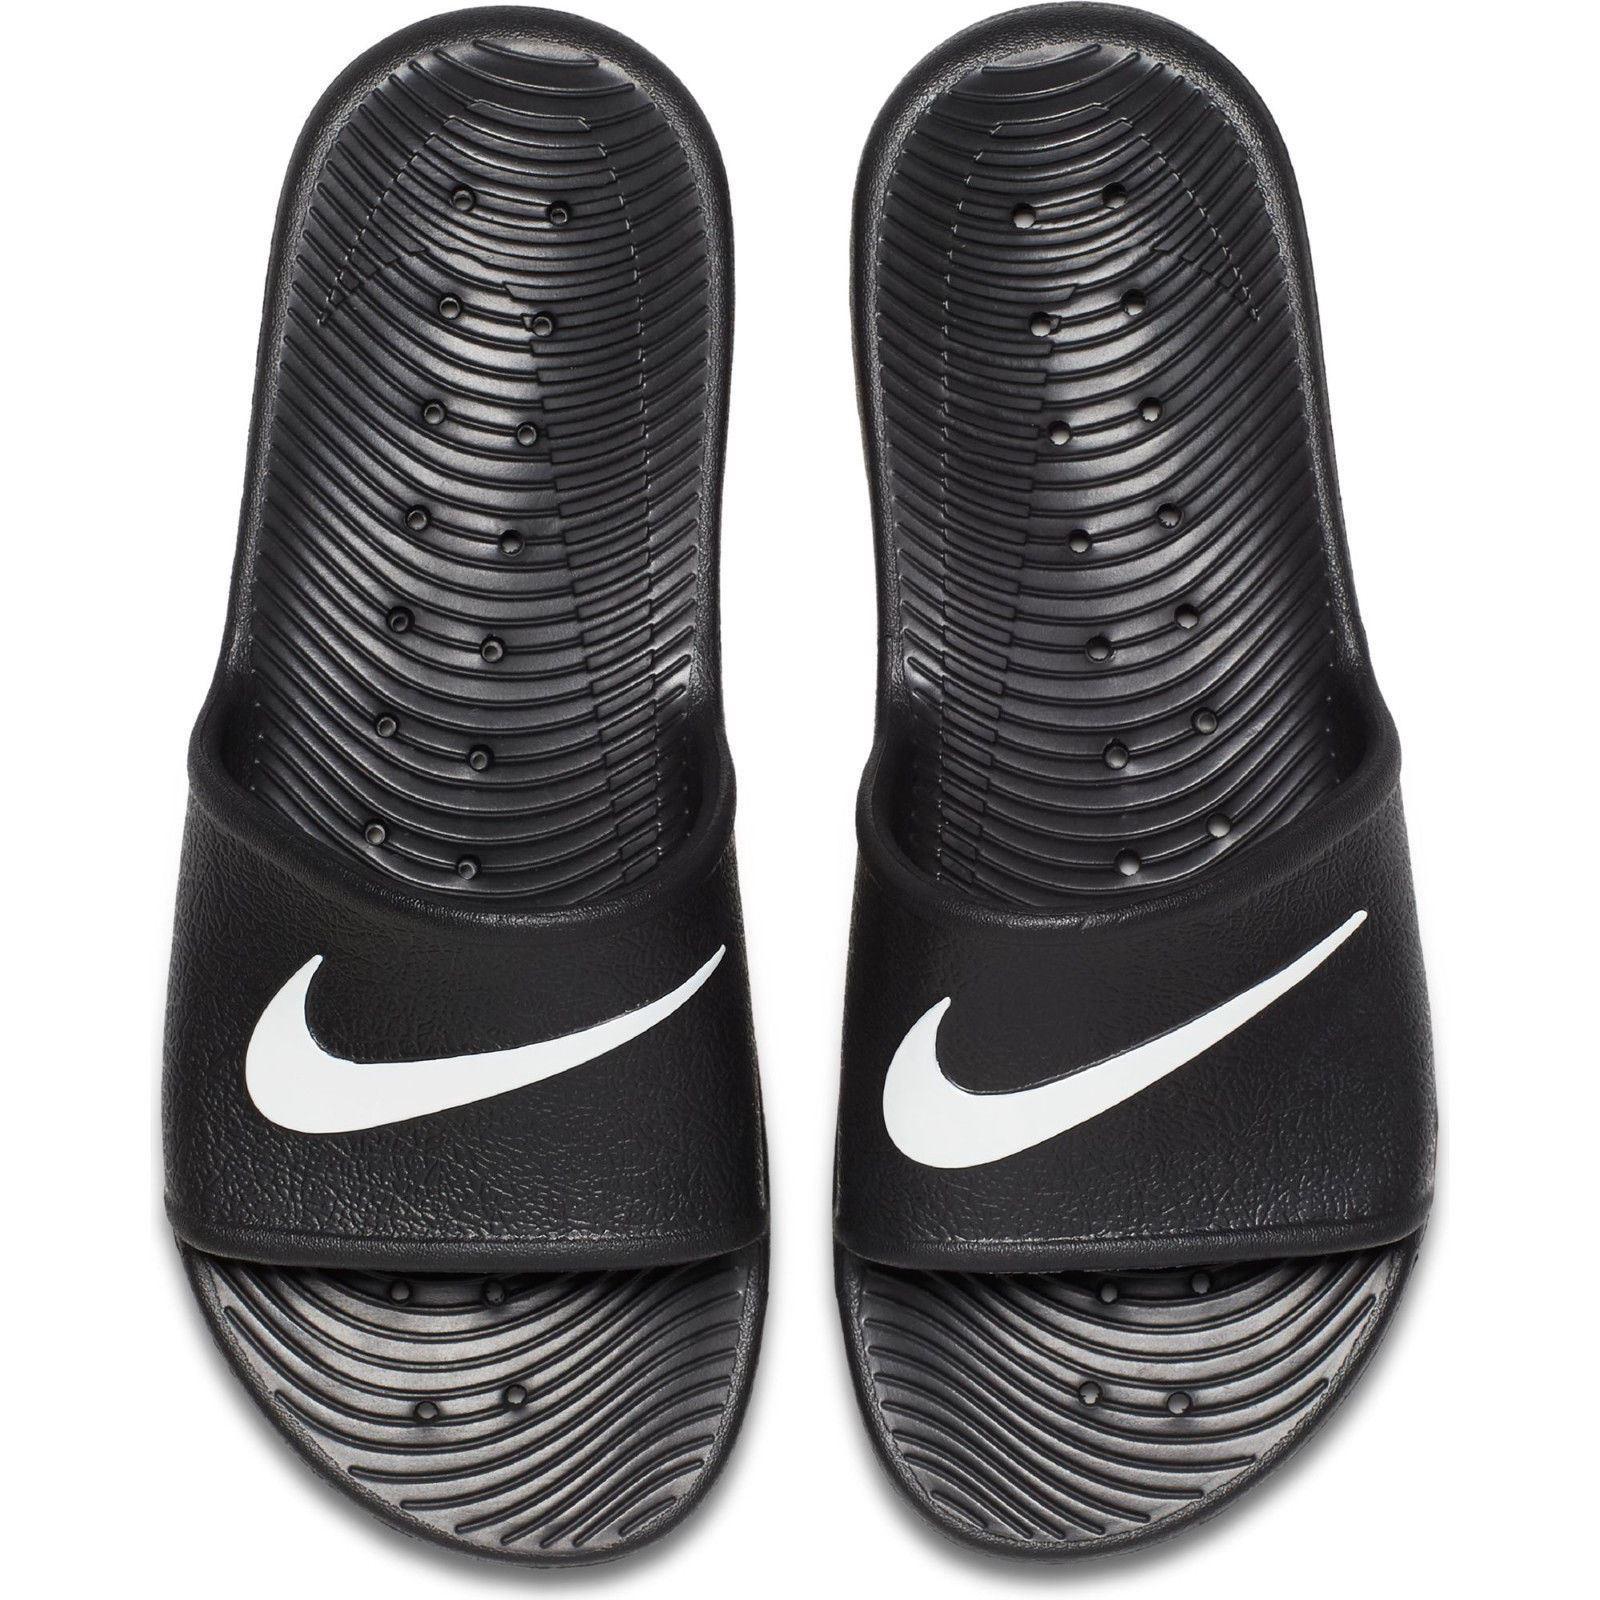 bf80589264f9 Nike Kawa Swoosh Mens Sliders UK 9 US 10 EUR 44 BR 42 Cm 28 for sale ...